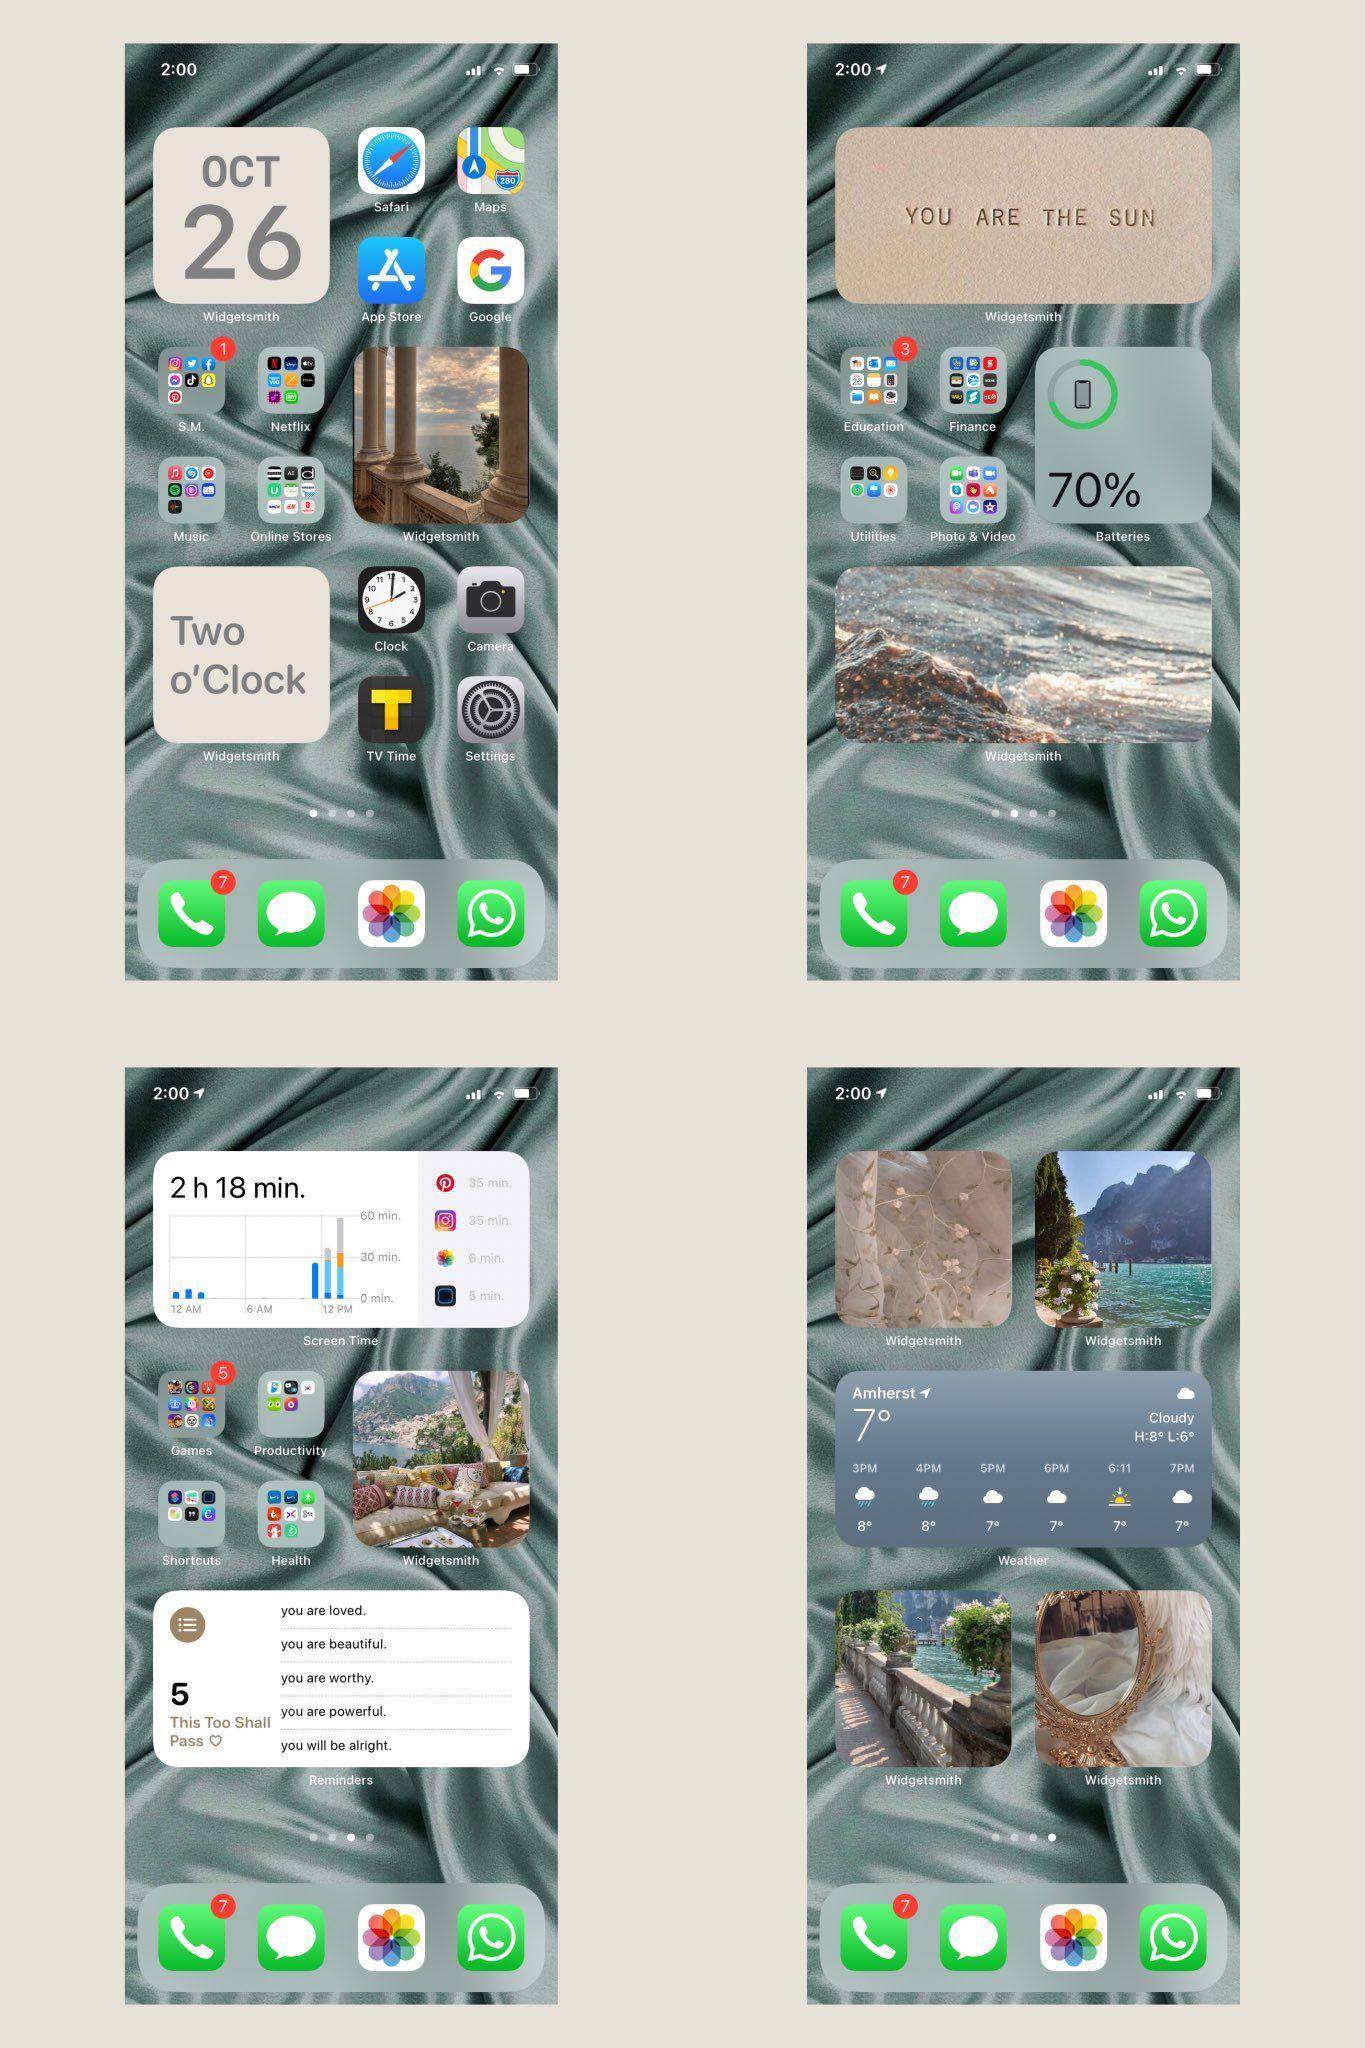 Twitter In 2021 Iphone Wallpaper App Ios App Iphone Iphone Wallpaper Ios